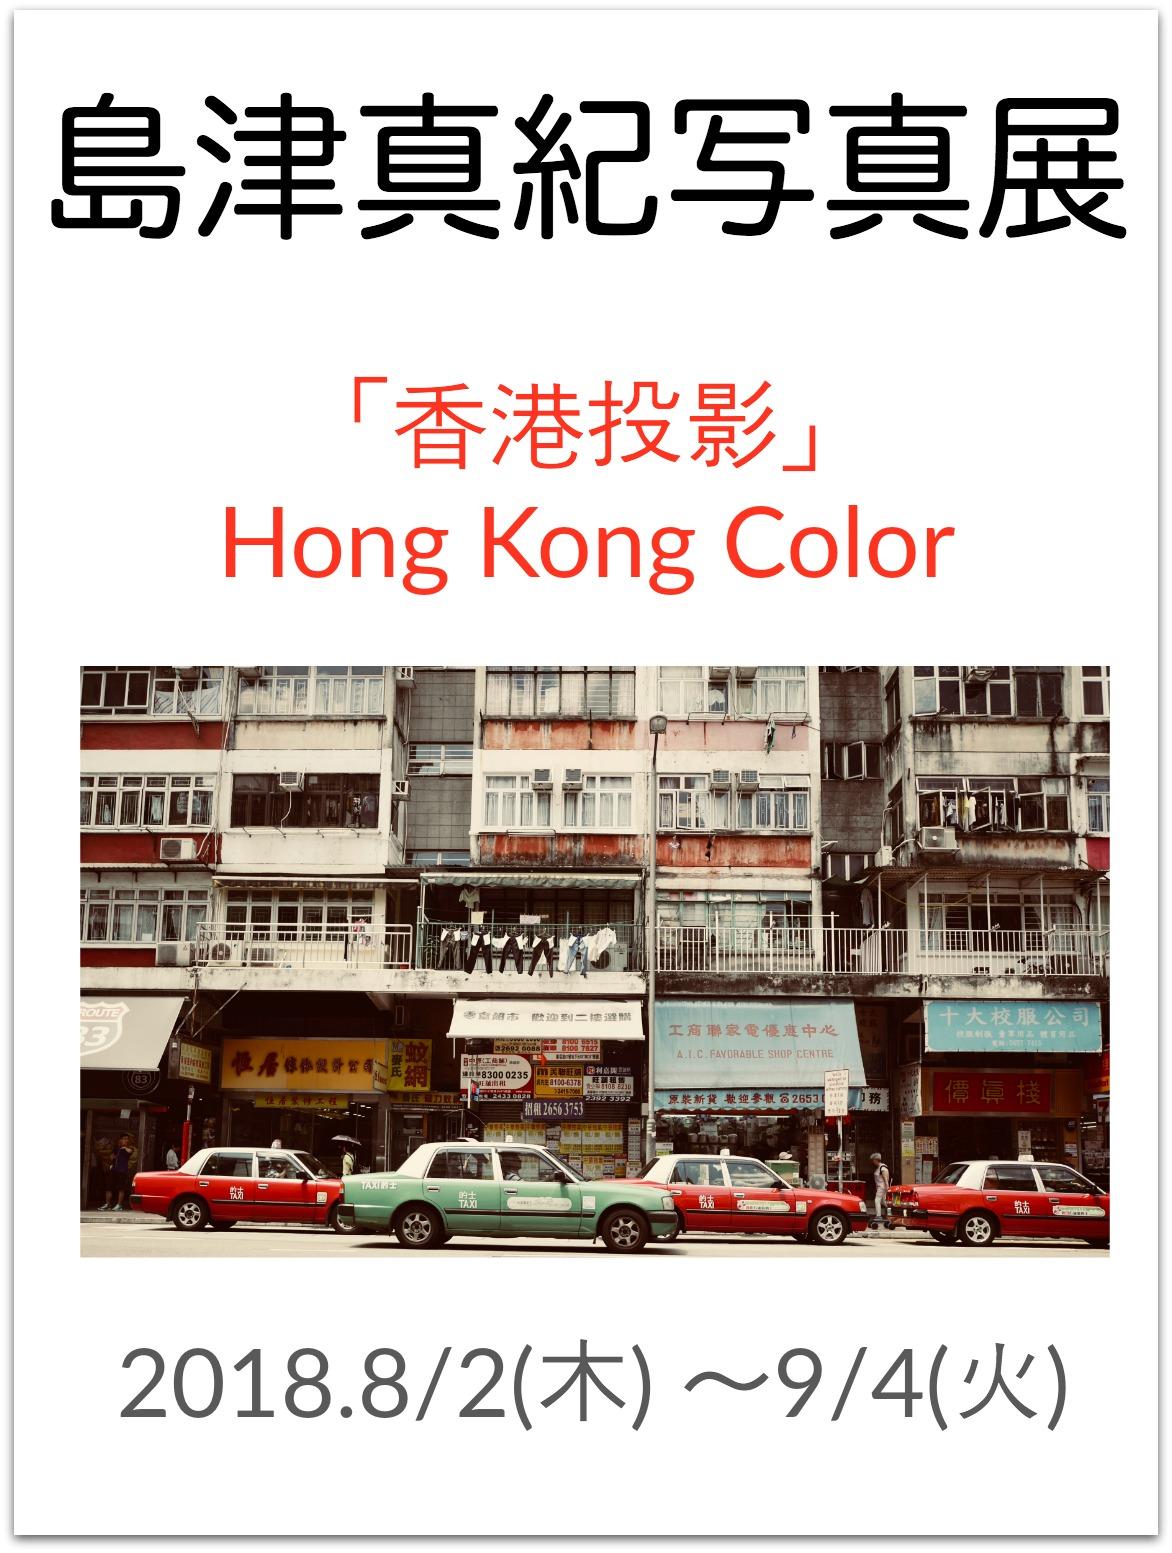 hkc_2018_poster